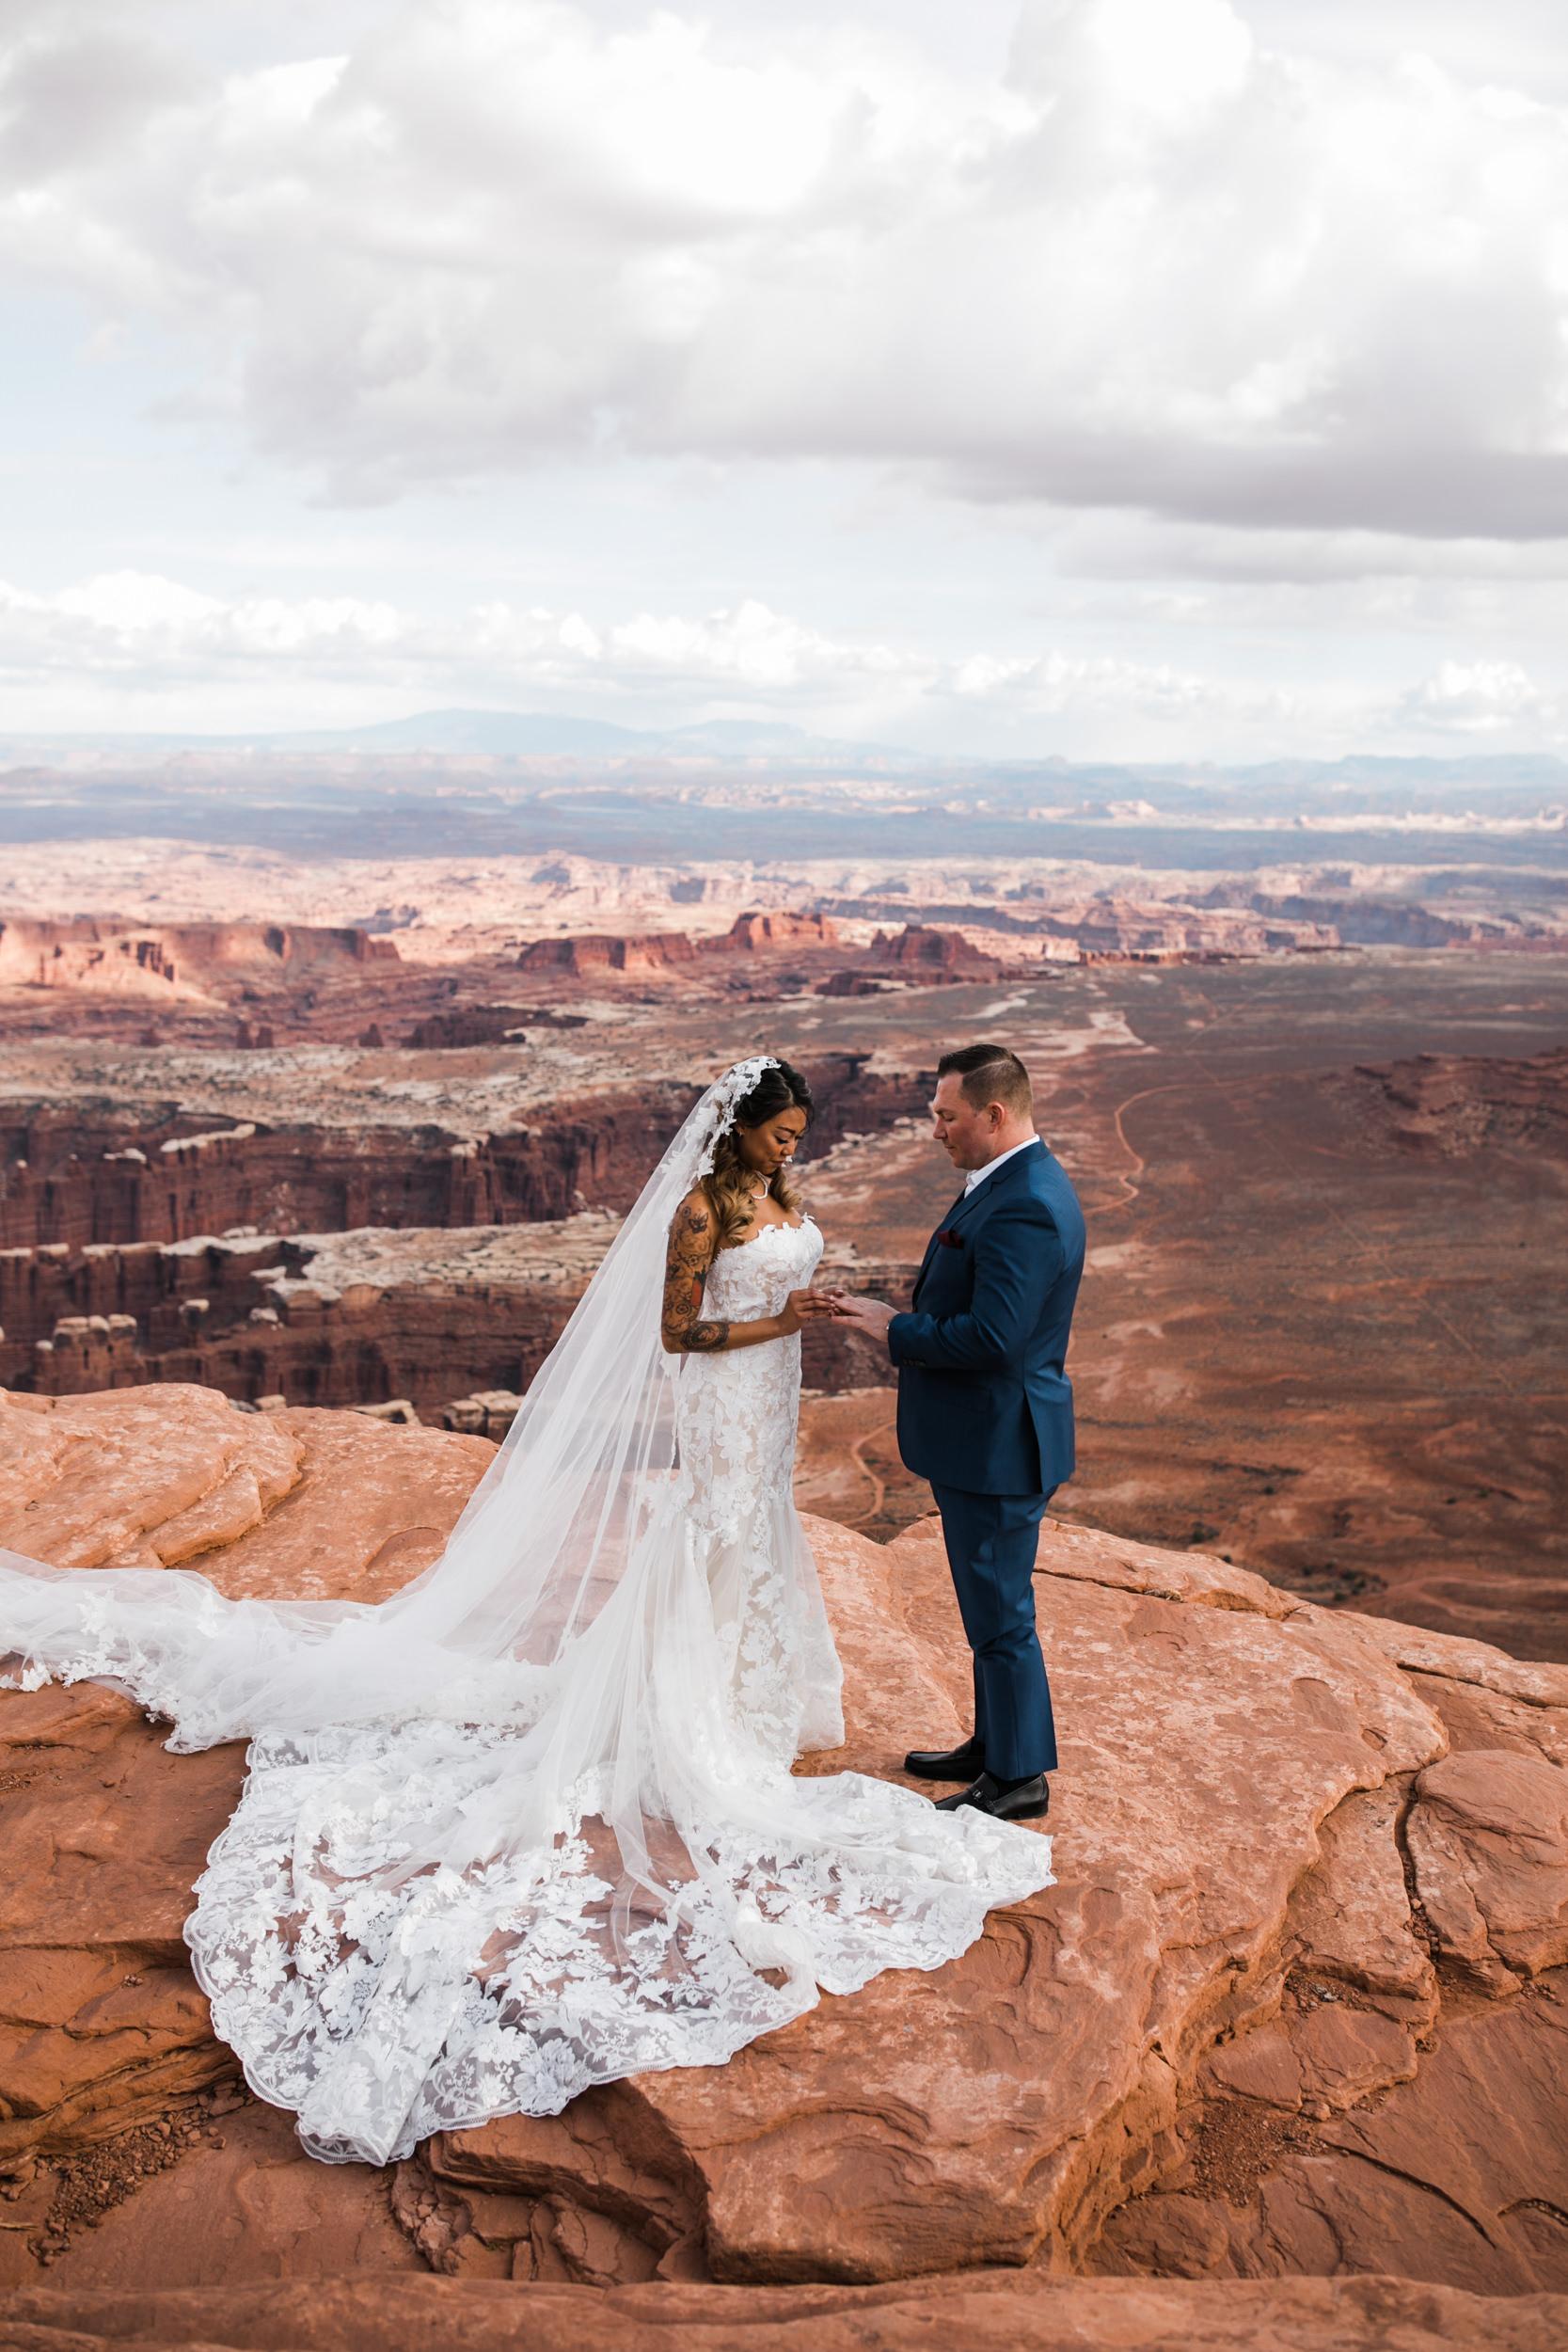 Hearnes-Elopement-Photography-Canyonlands-National-Park-Wedding-Photographer-Moab-Utah-Weddings-17.JPG